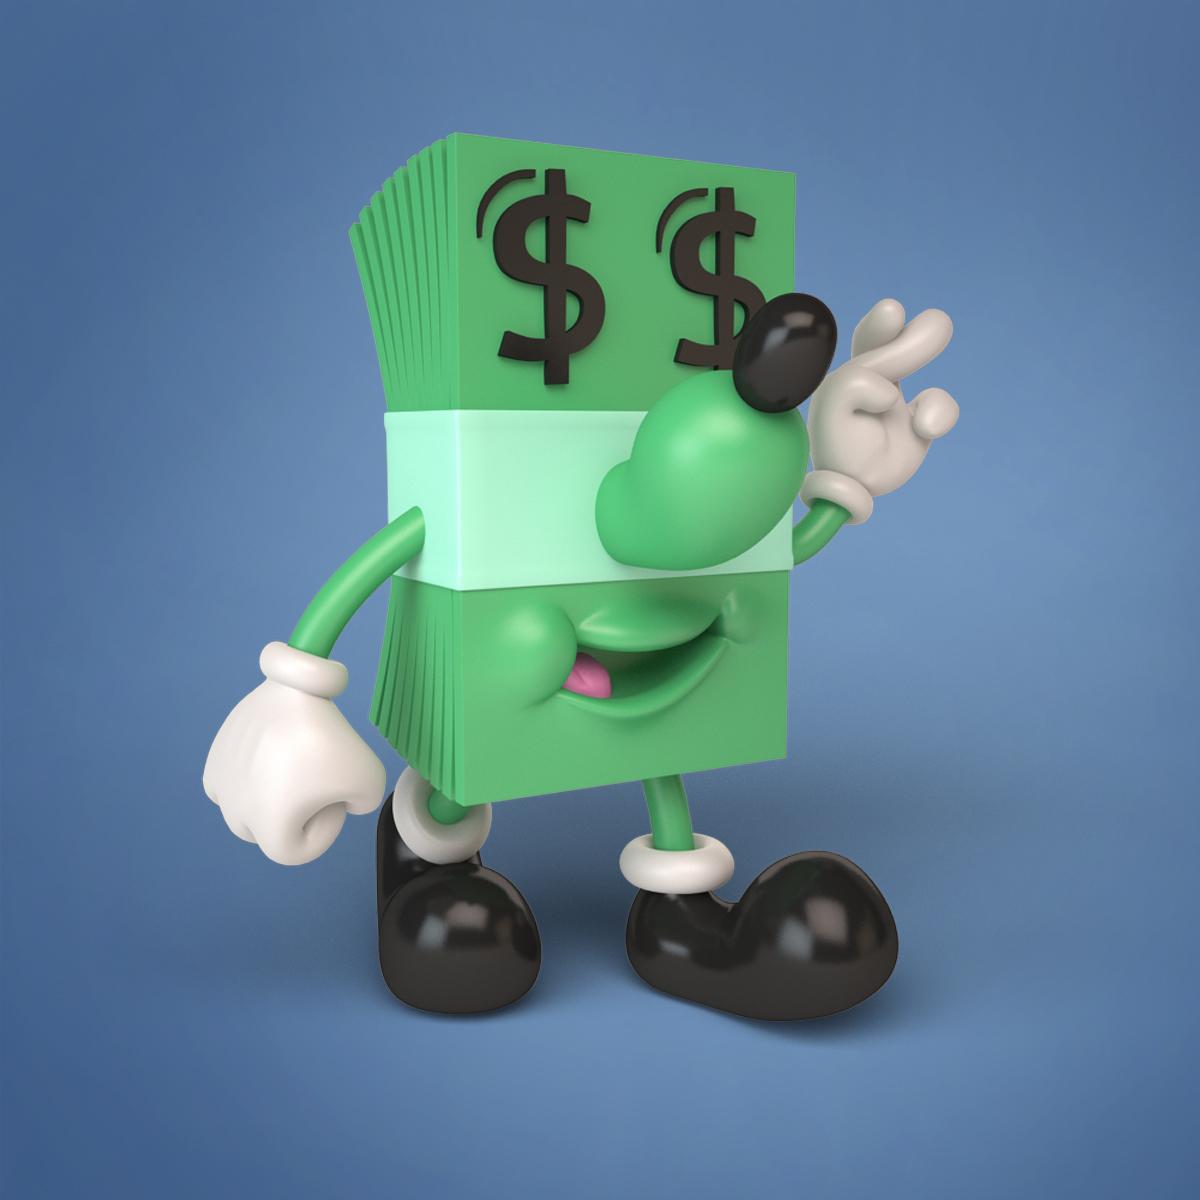 Jeremyville-lucky-dime-dollar-J_money_01_o.jpg